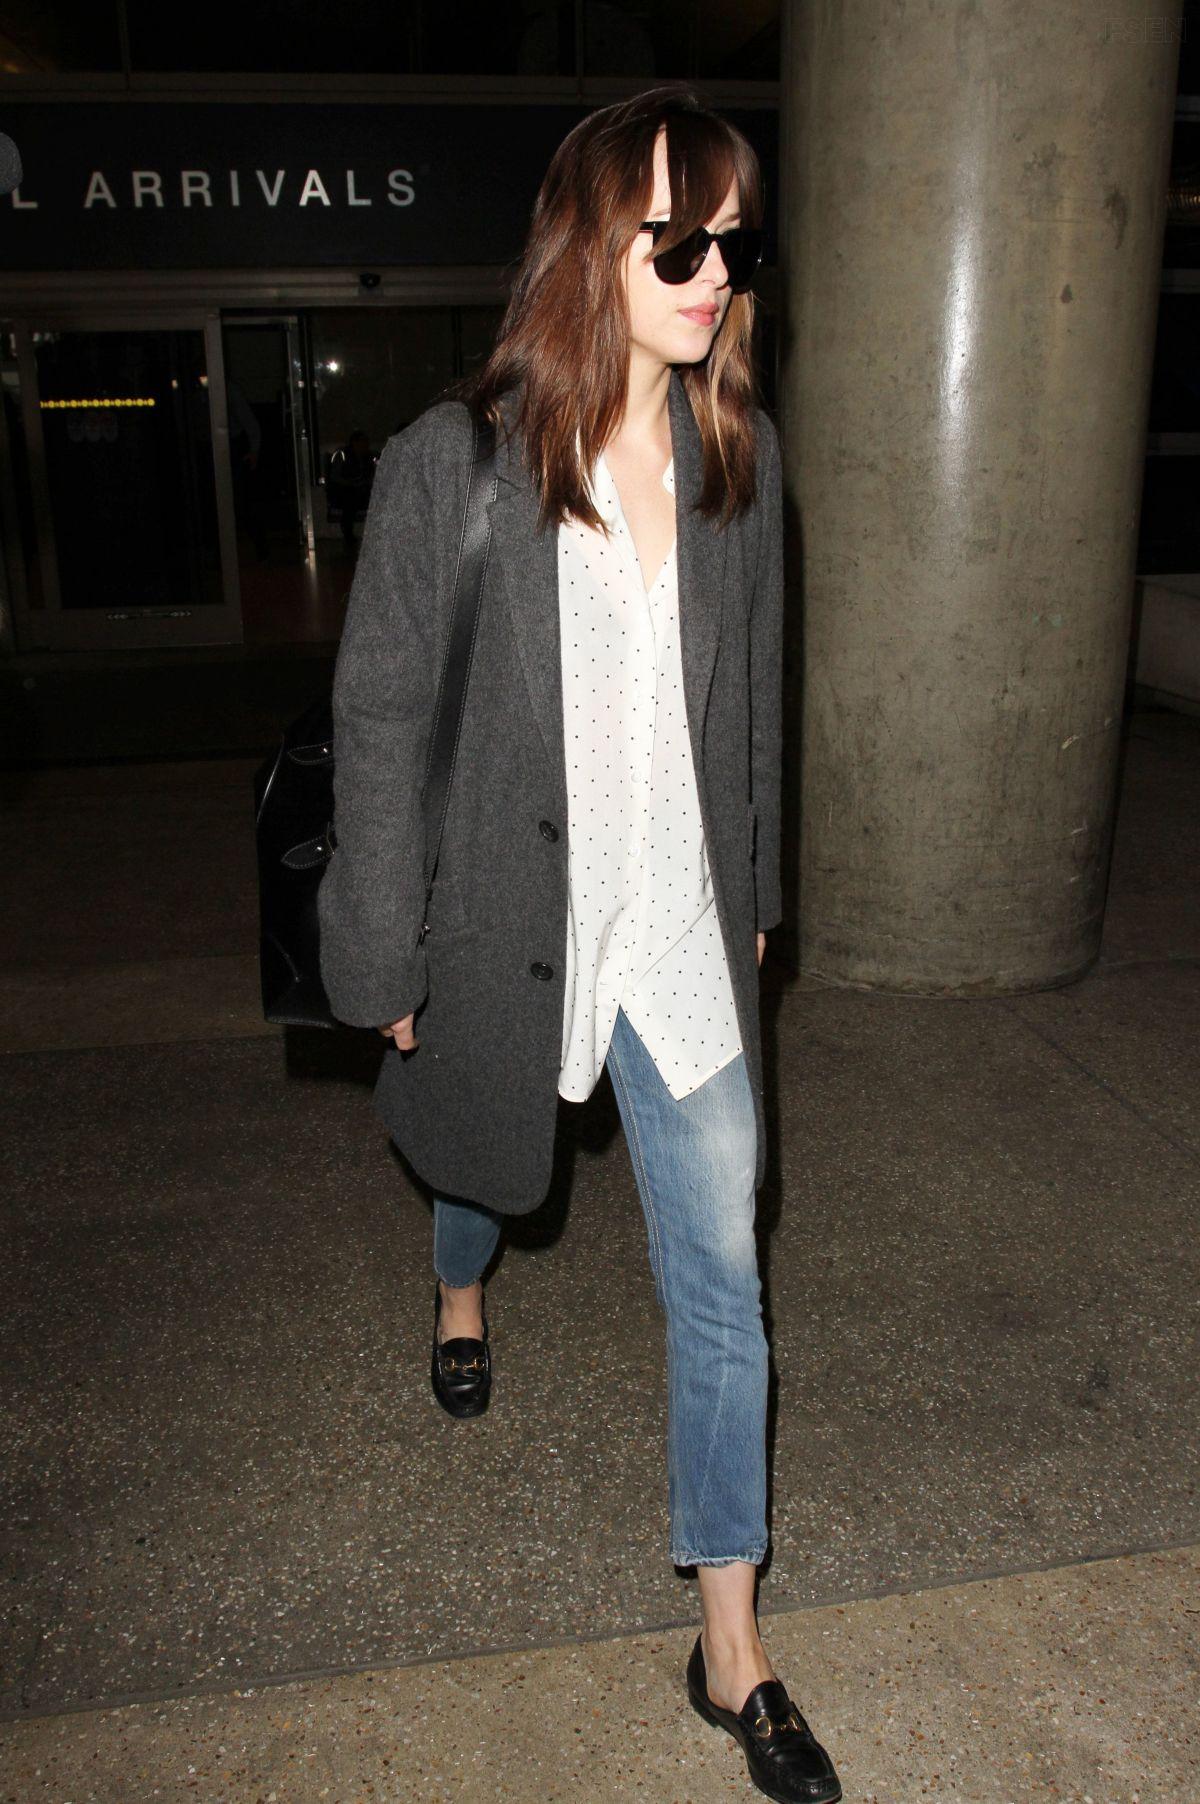 DAKOTA JOHNSON at Los Angeles Intenational Airport 11/04/2016